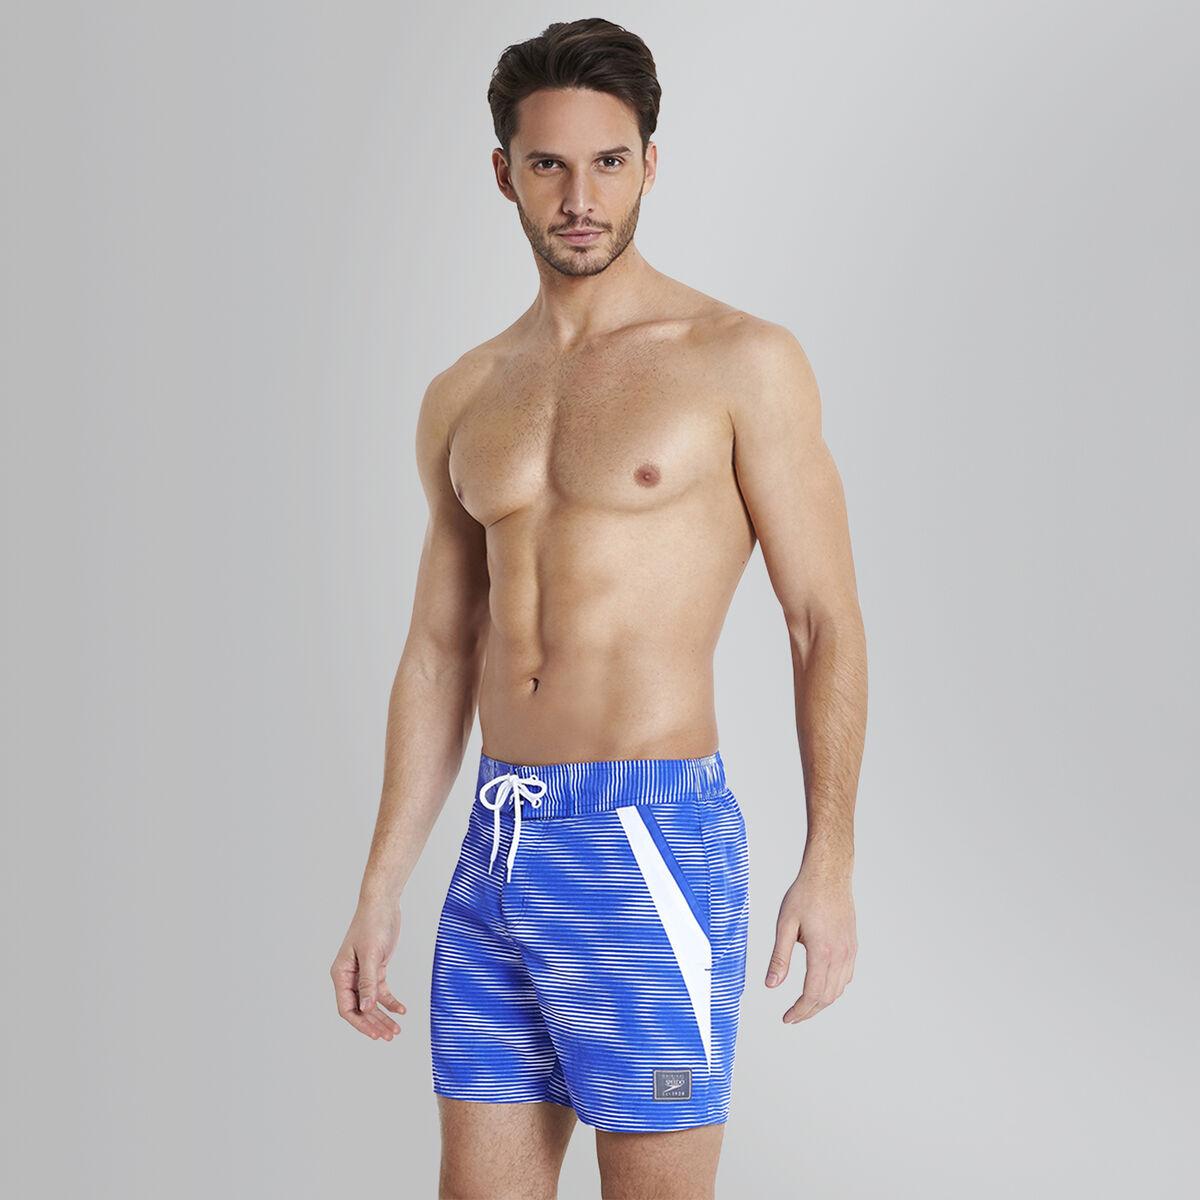 Marlinwave Retro Leisure Swim Short